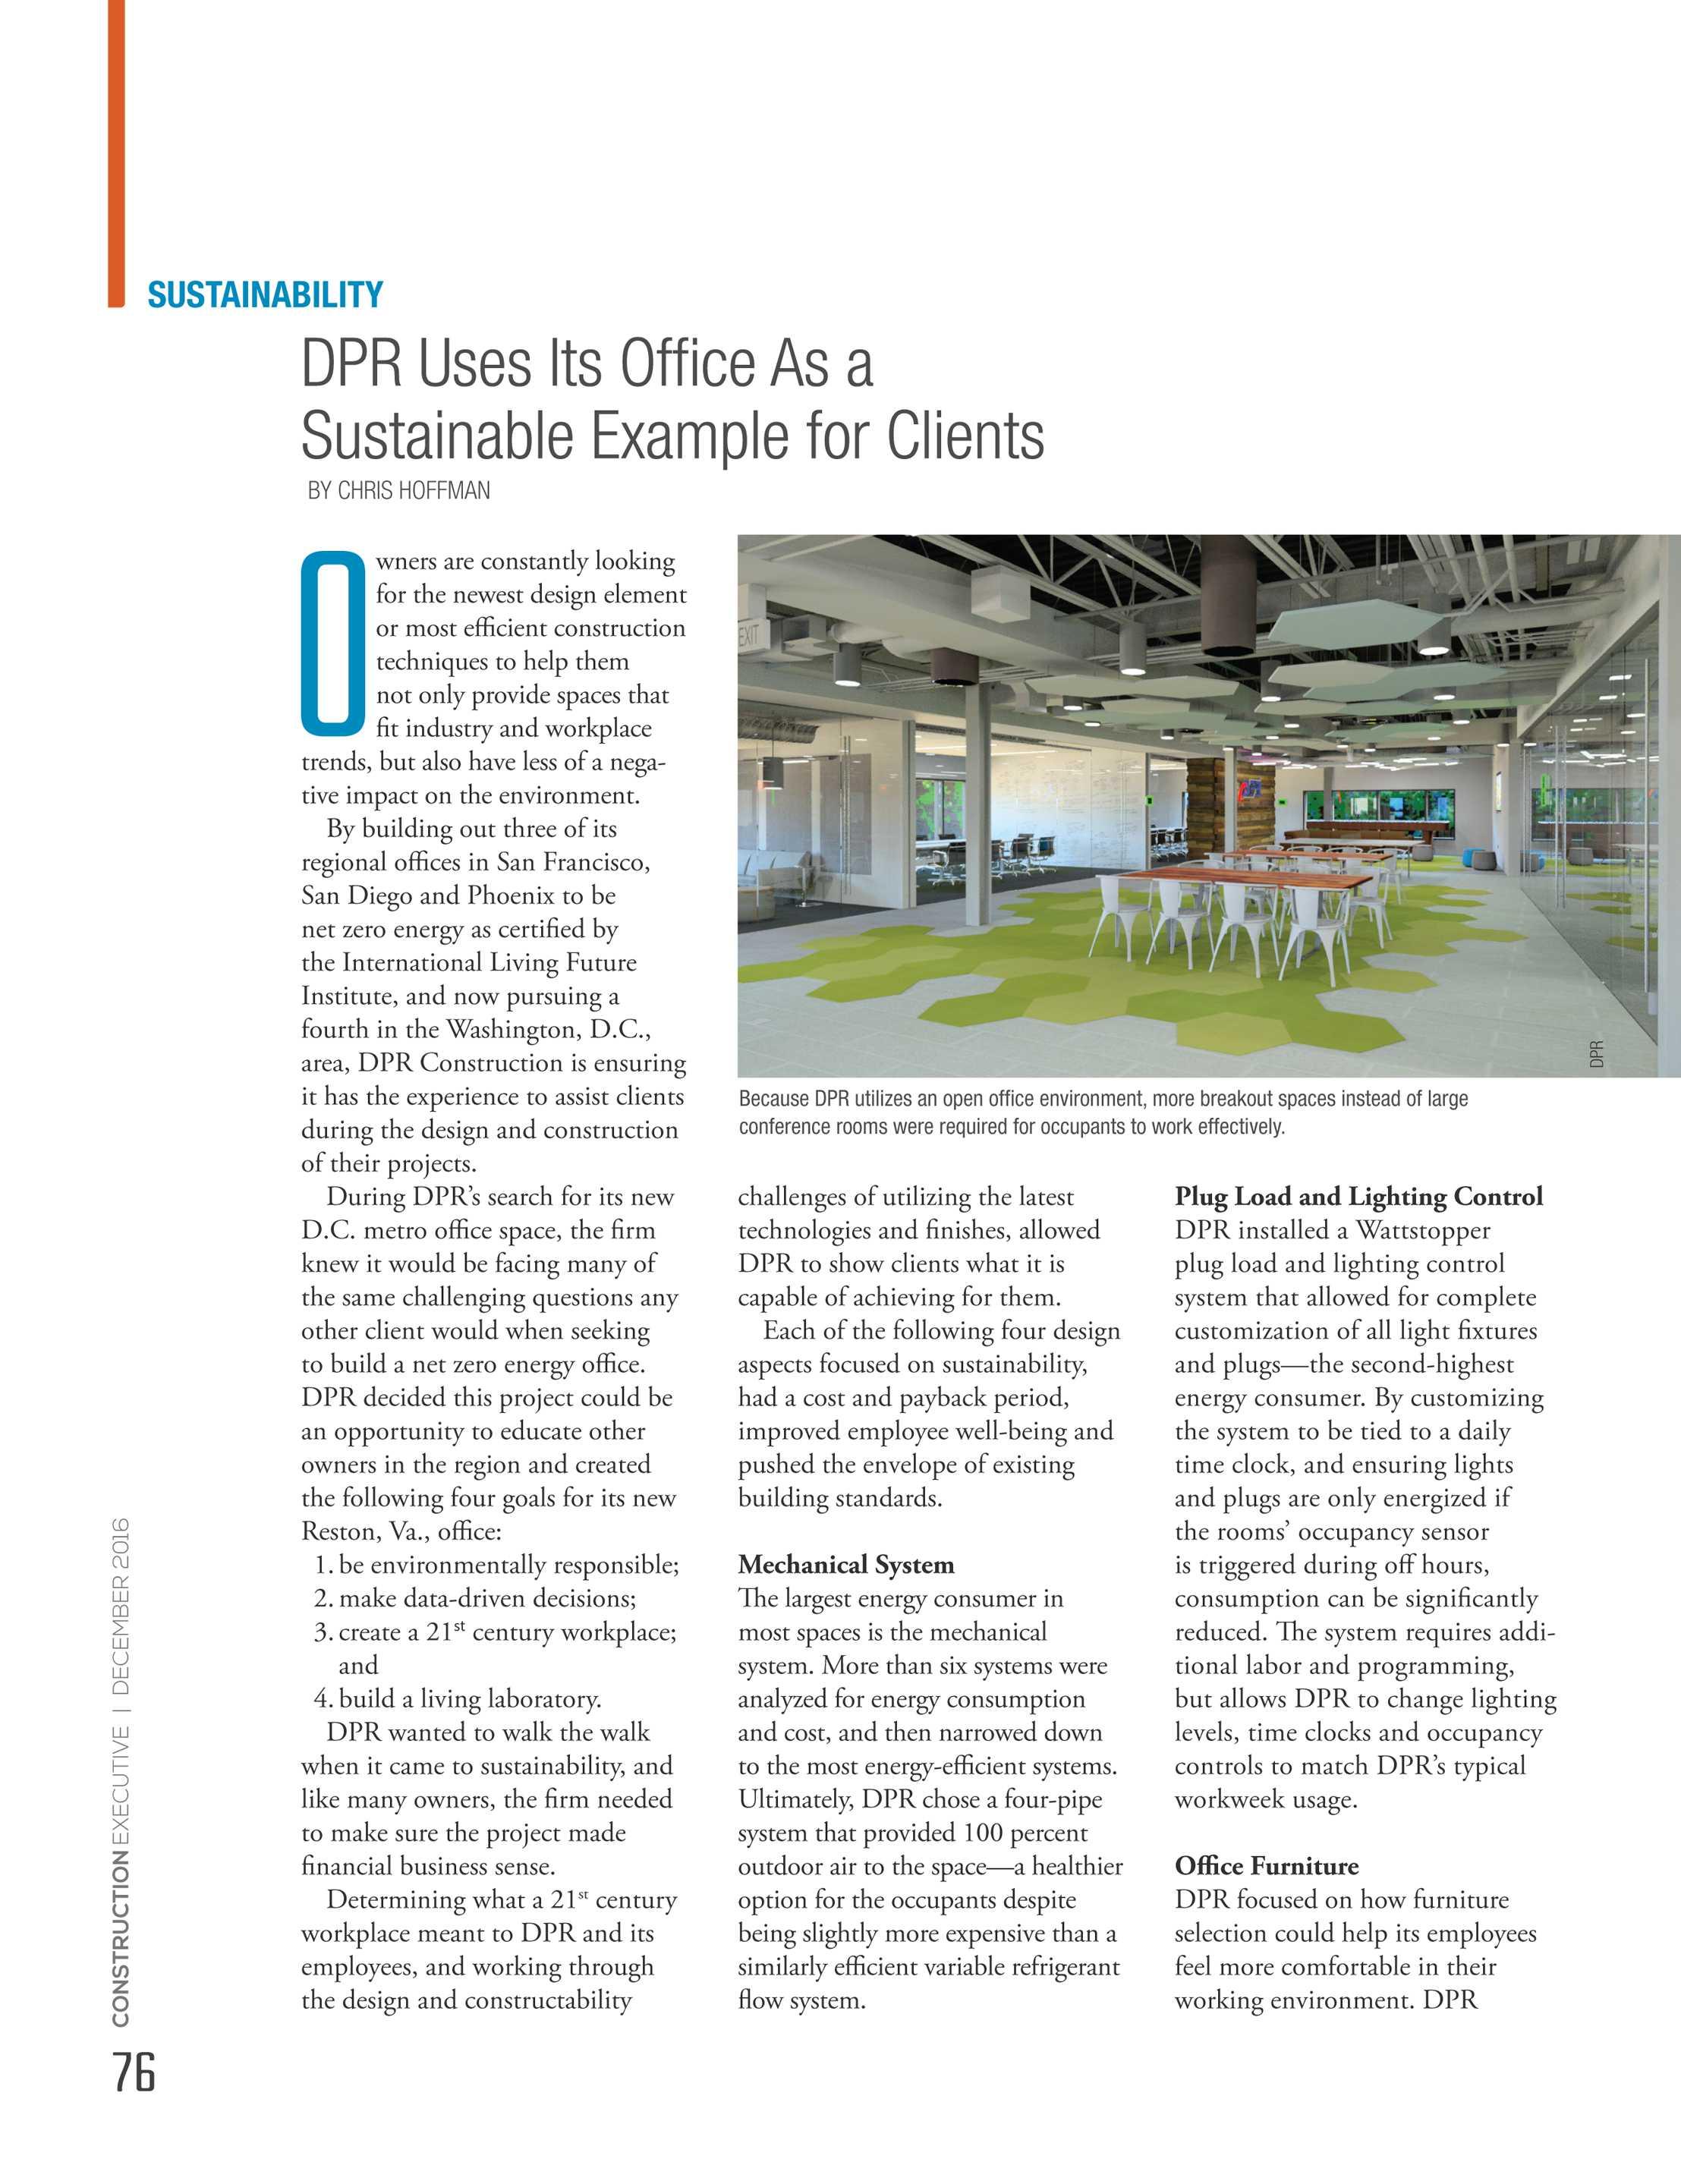 Construction Executive Magazine - December 2016 - page 76